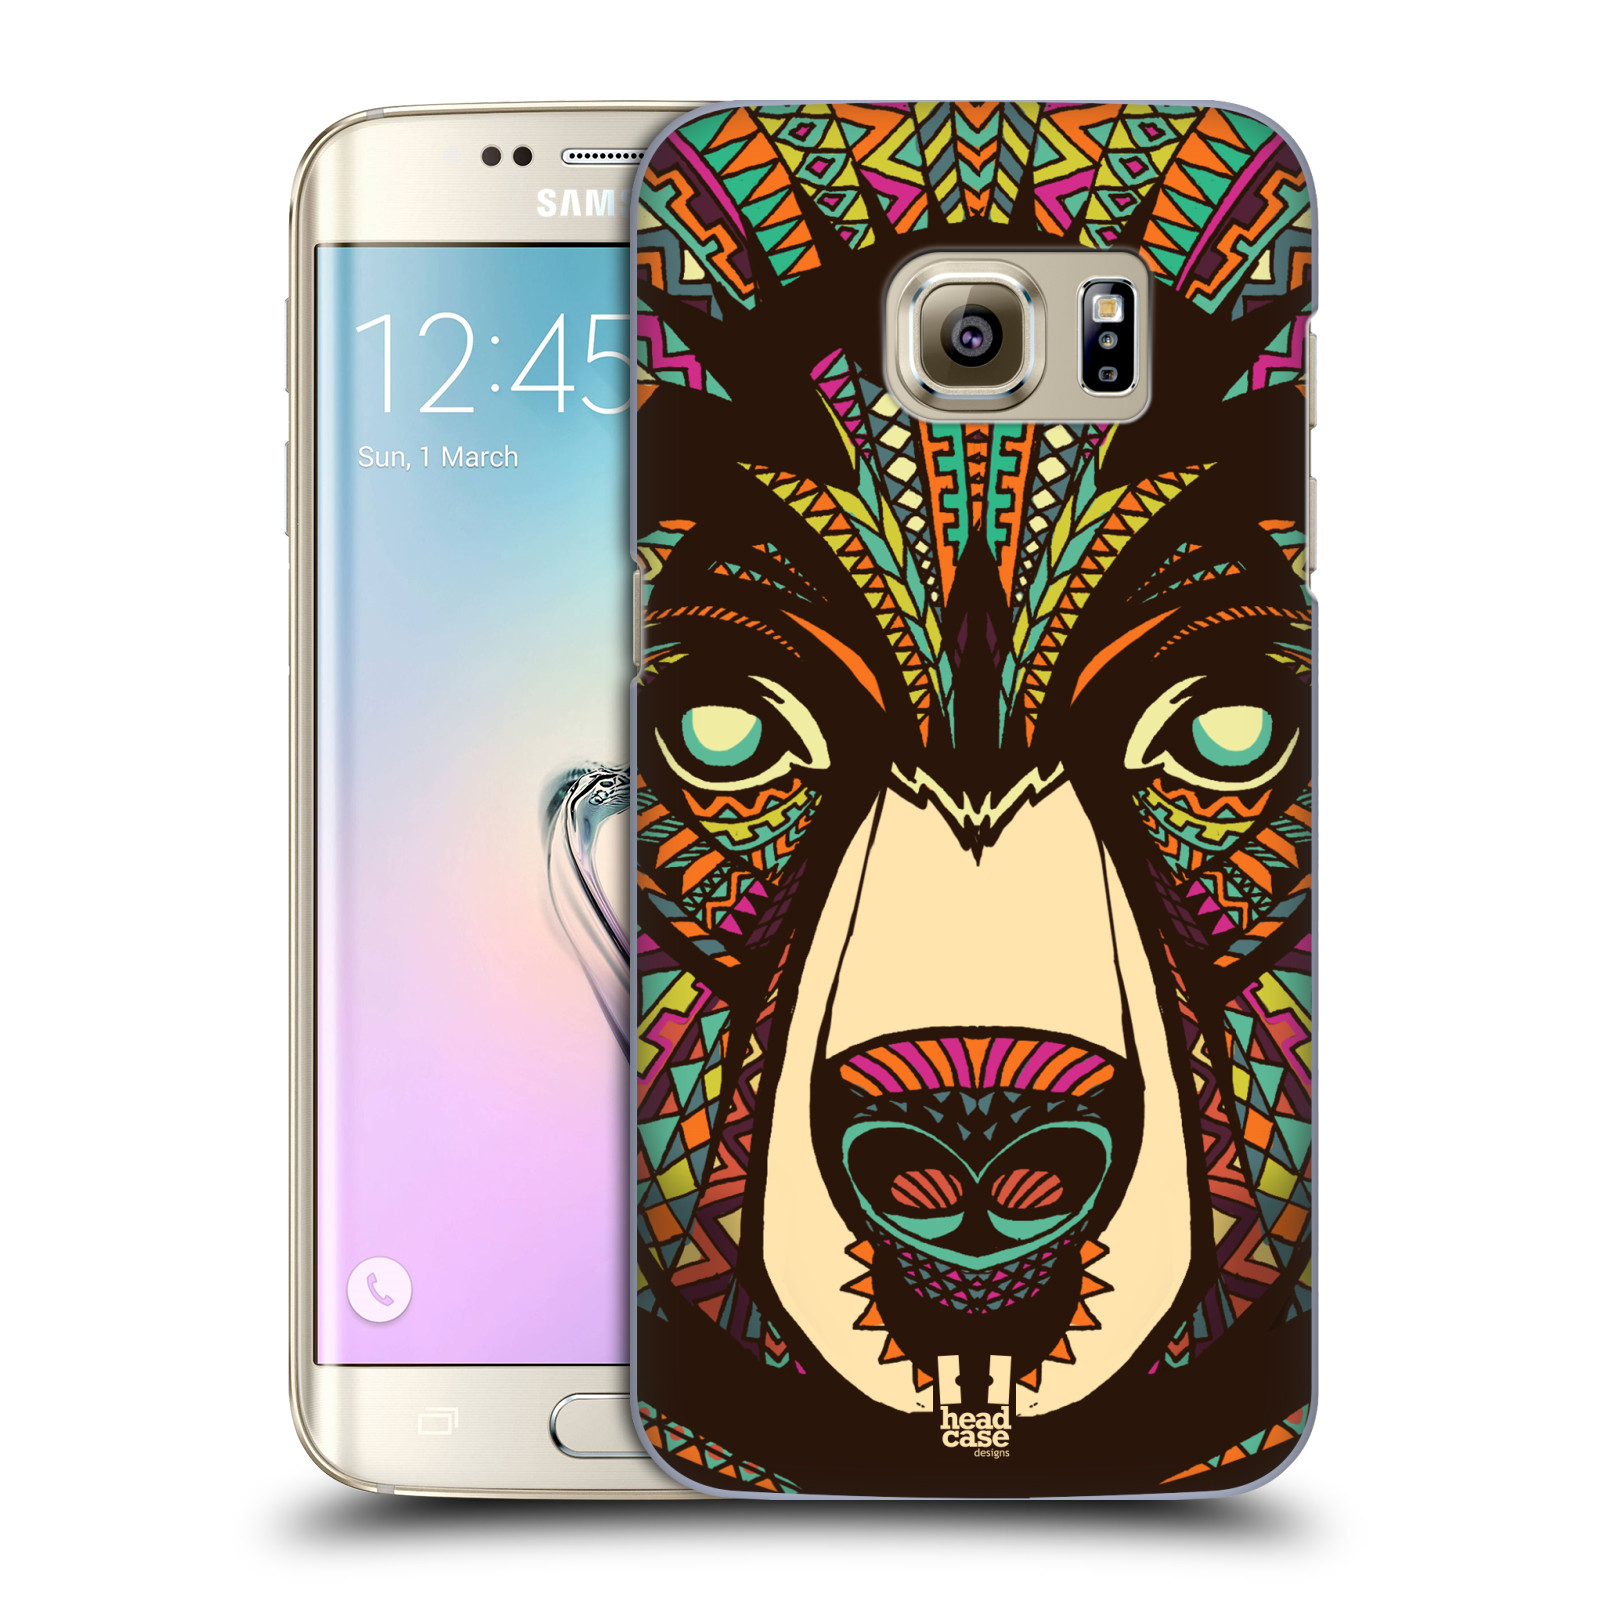 HEAD CASE plastový obal na mobil SAMSUNG GALAXY S7 EDGE vzor Aztécký motiv zvíře medvěd